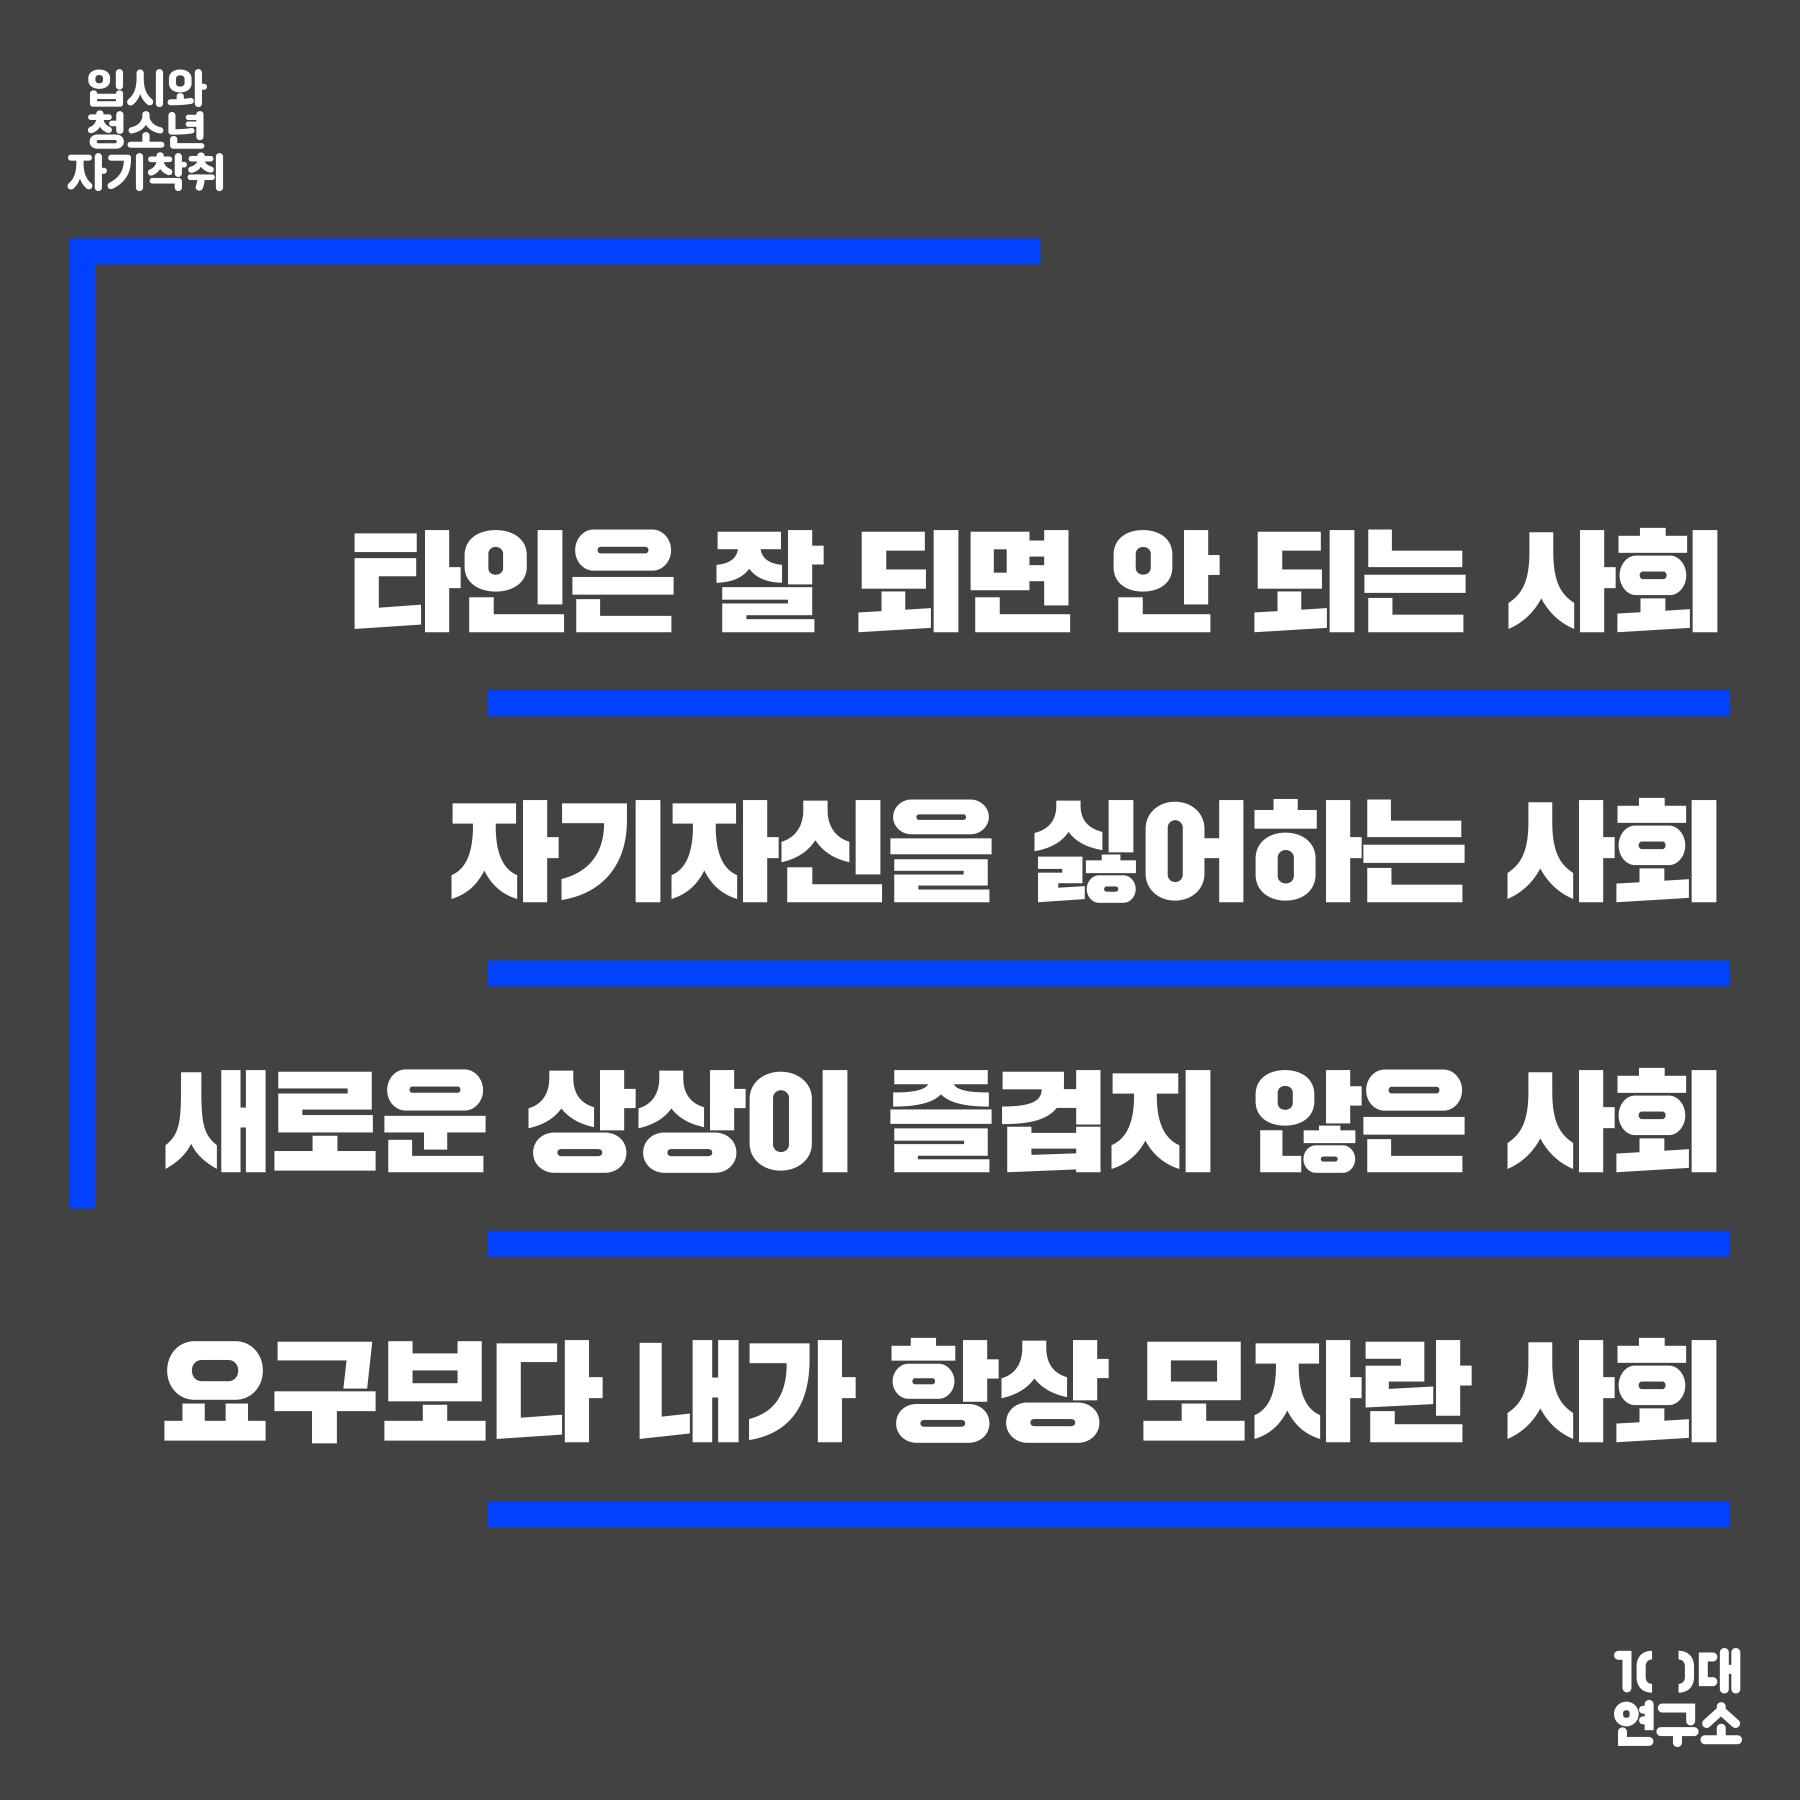 A_입시와 청소년 자기착취_18.png